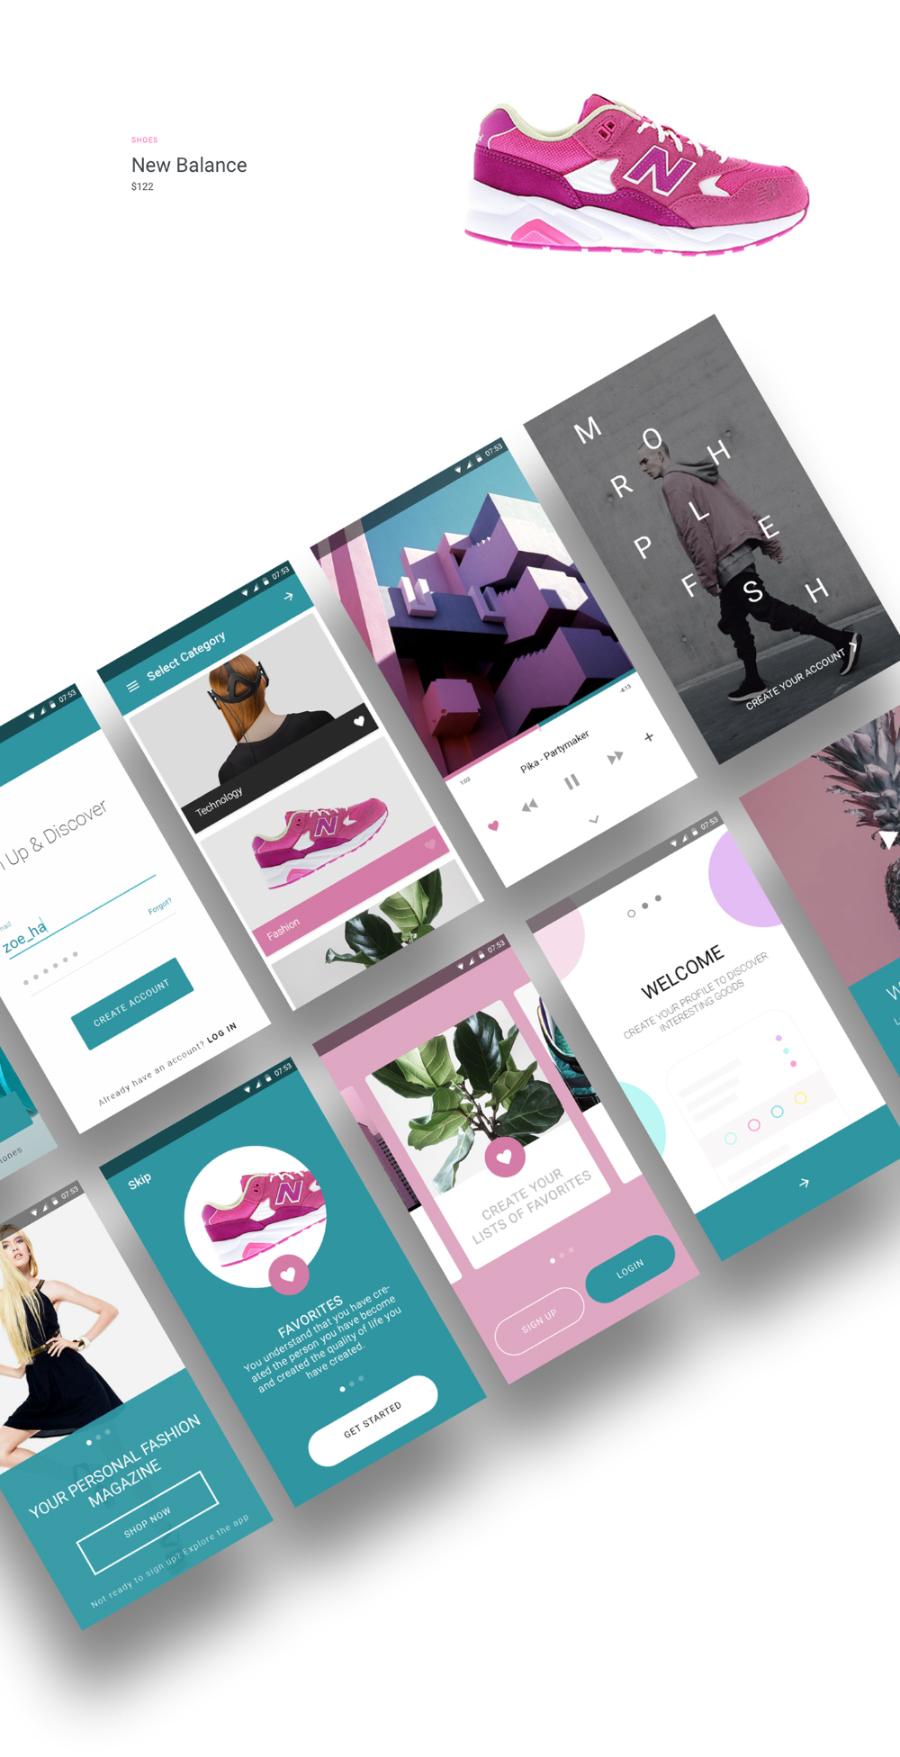 Modern Fashion App Material UI Kit Free PSD